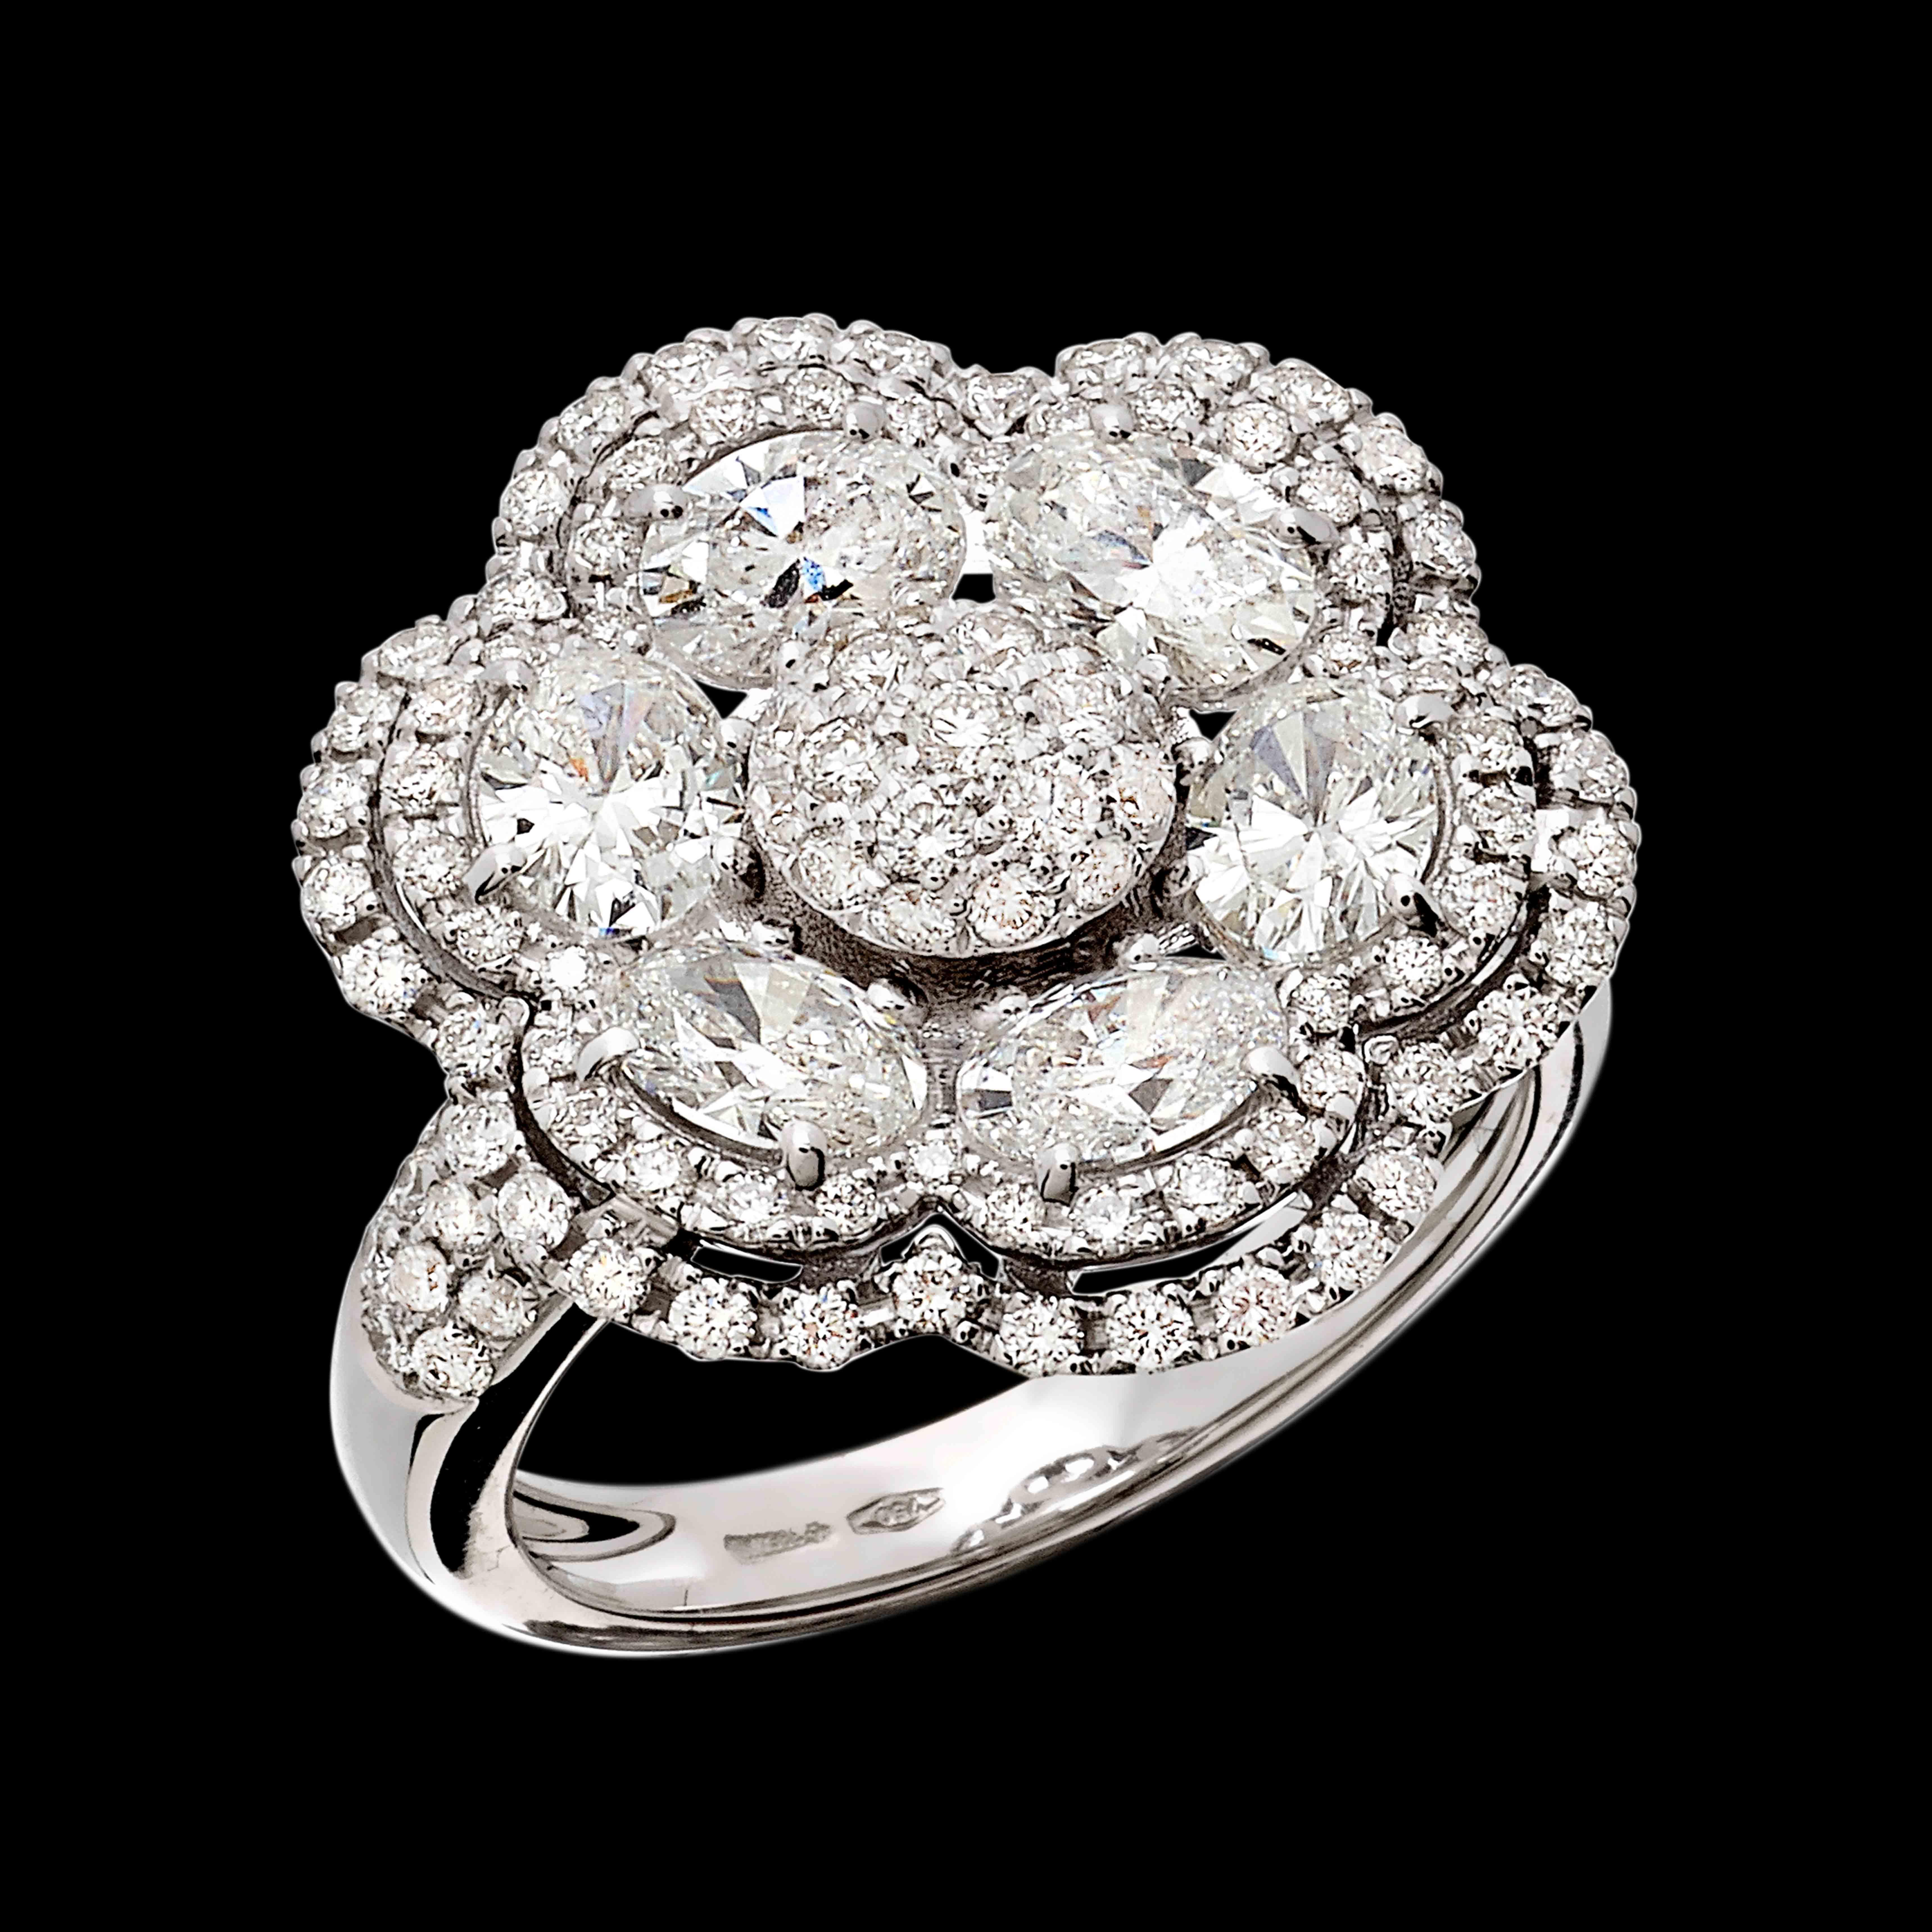 Massimo Raiteri exclusive jewellery diamonds diamanti anelli ring jewelery jewel ruby emerald sapphires diamonds rubini smeraldi zaffiiri diamanti flower fiori high